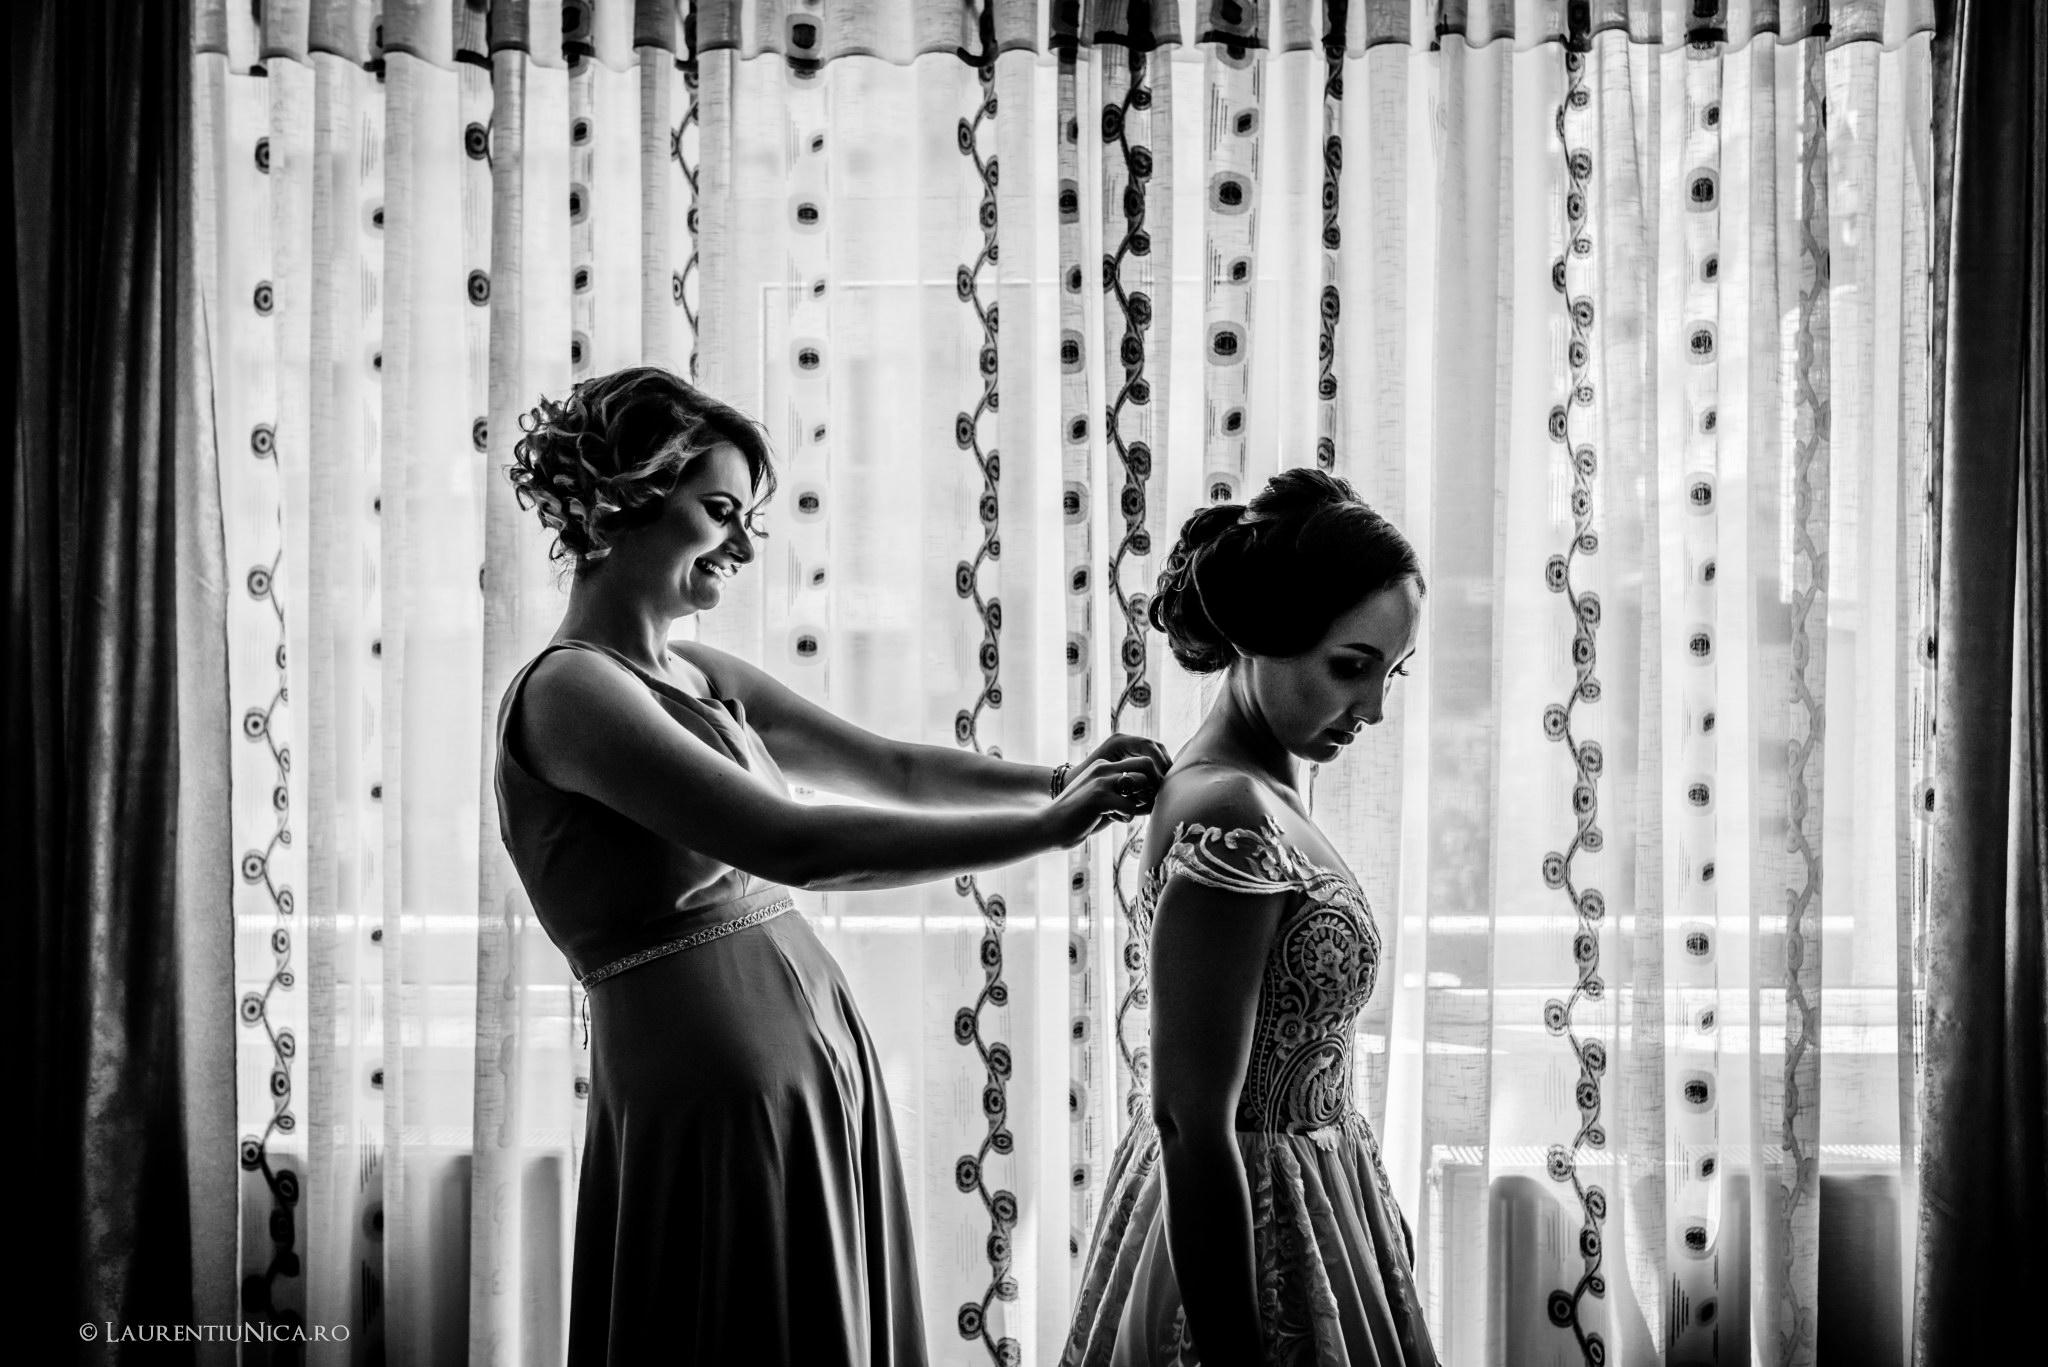 daiana si madalin fotograf nunta laurentiu nica targu jiu gorj 08 - Daiana & Madalin | Fotografii nunta | Targu-Jiu | Gorj